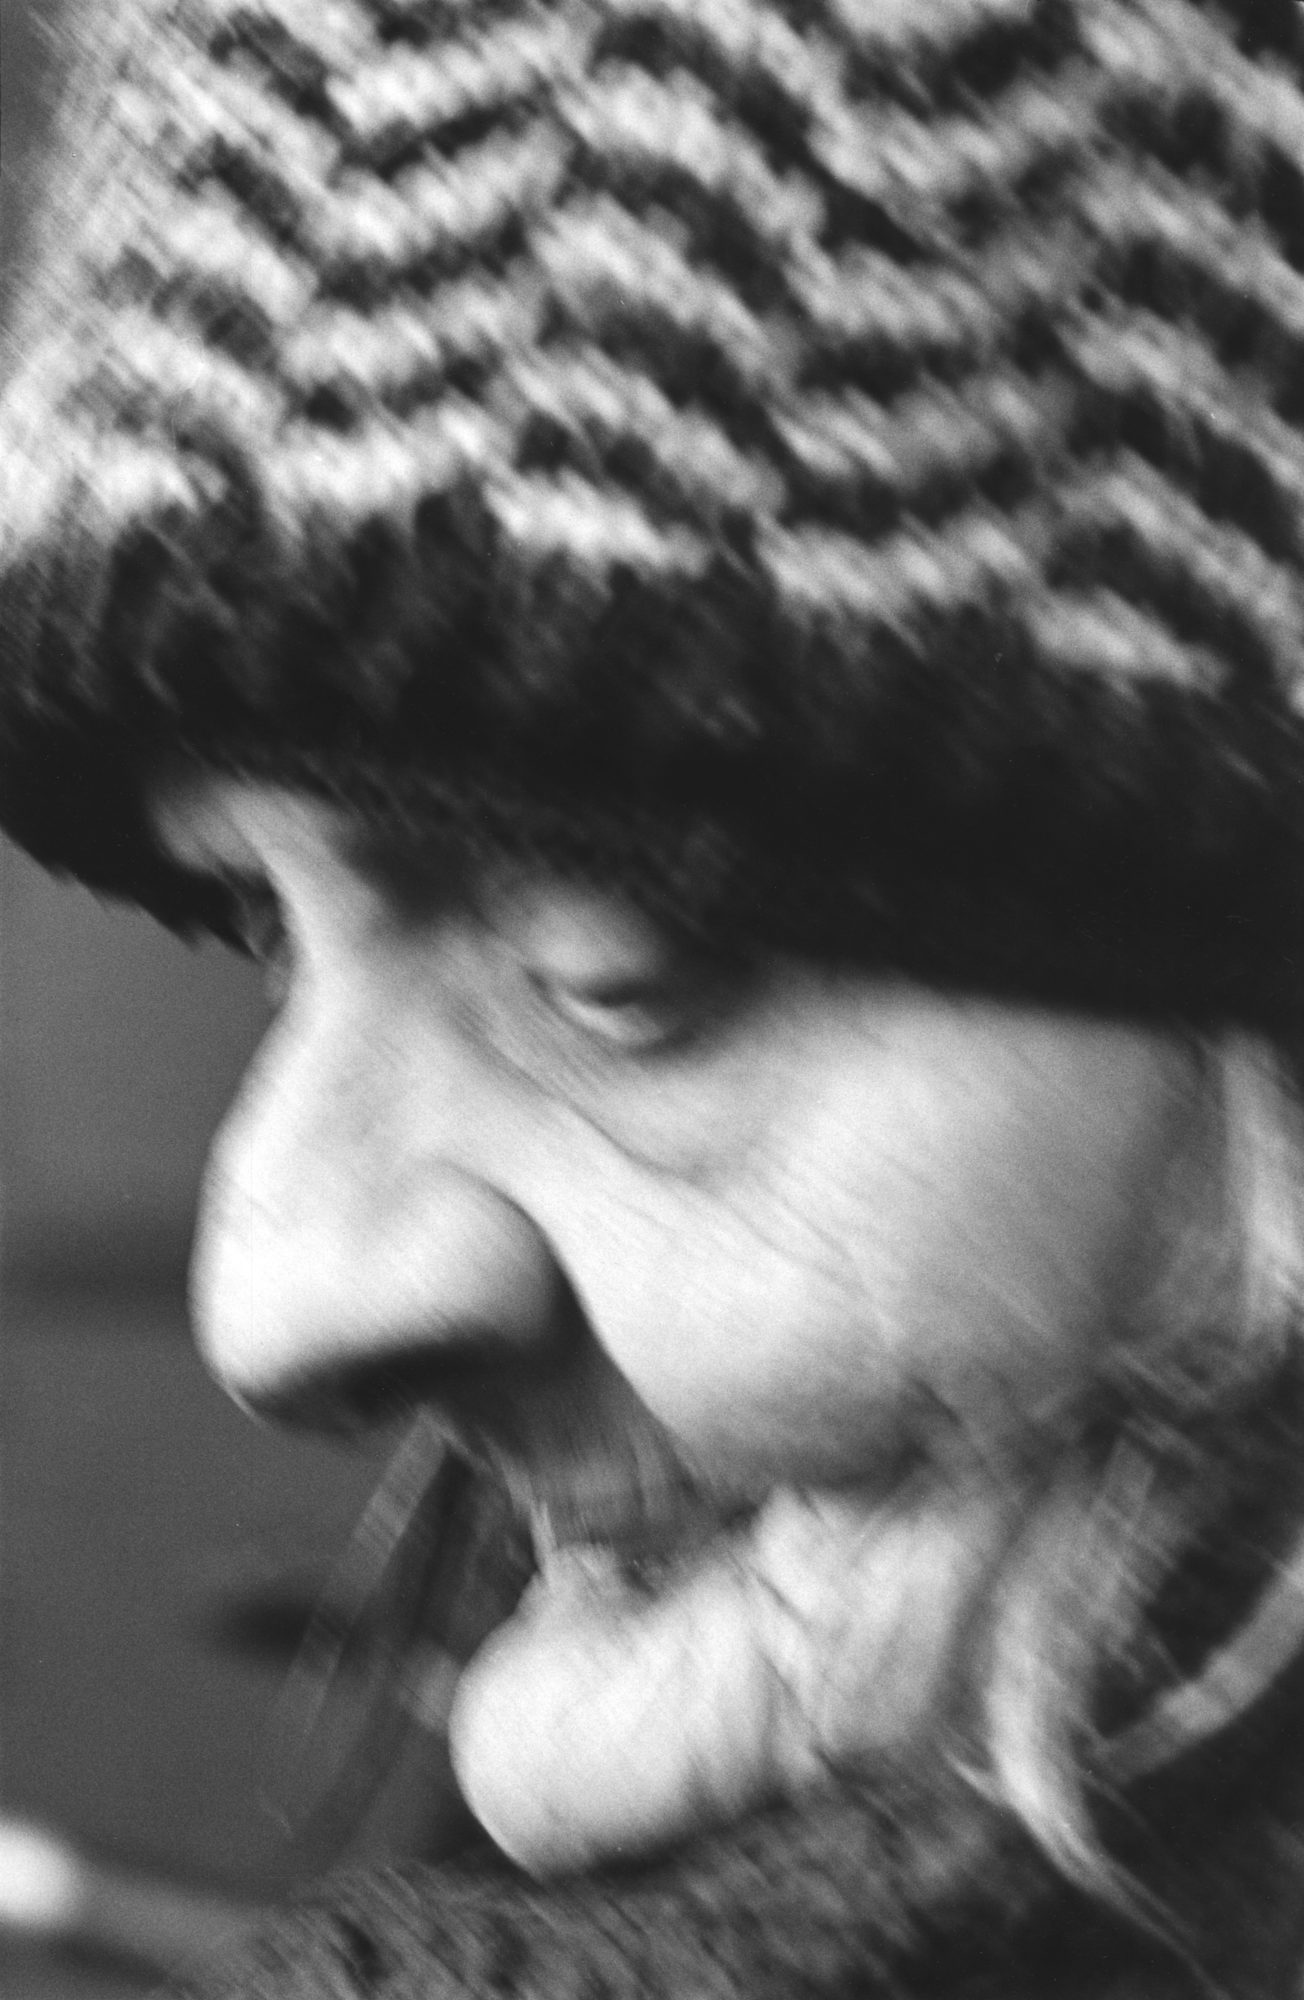 Anonymes - François-Marie Banier